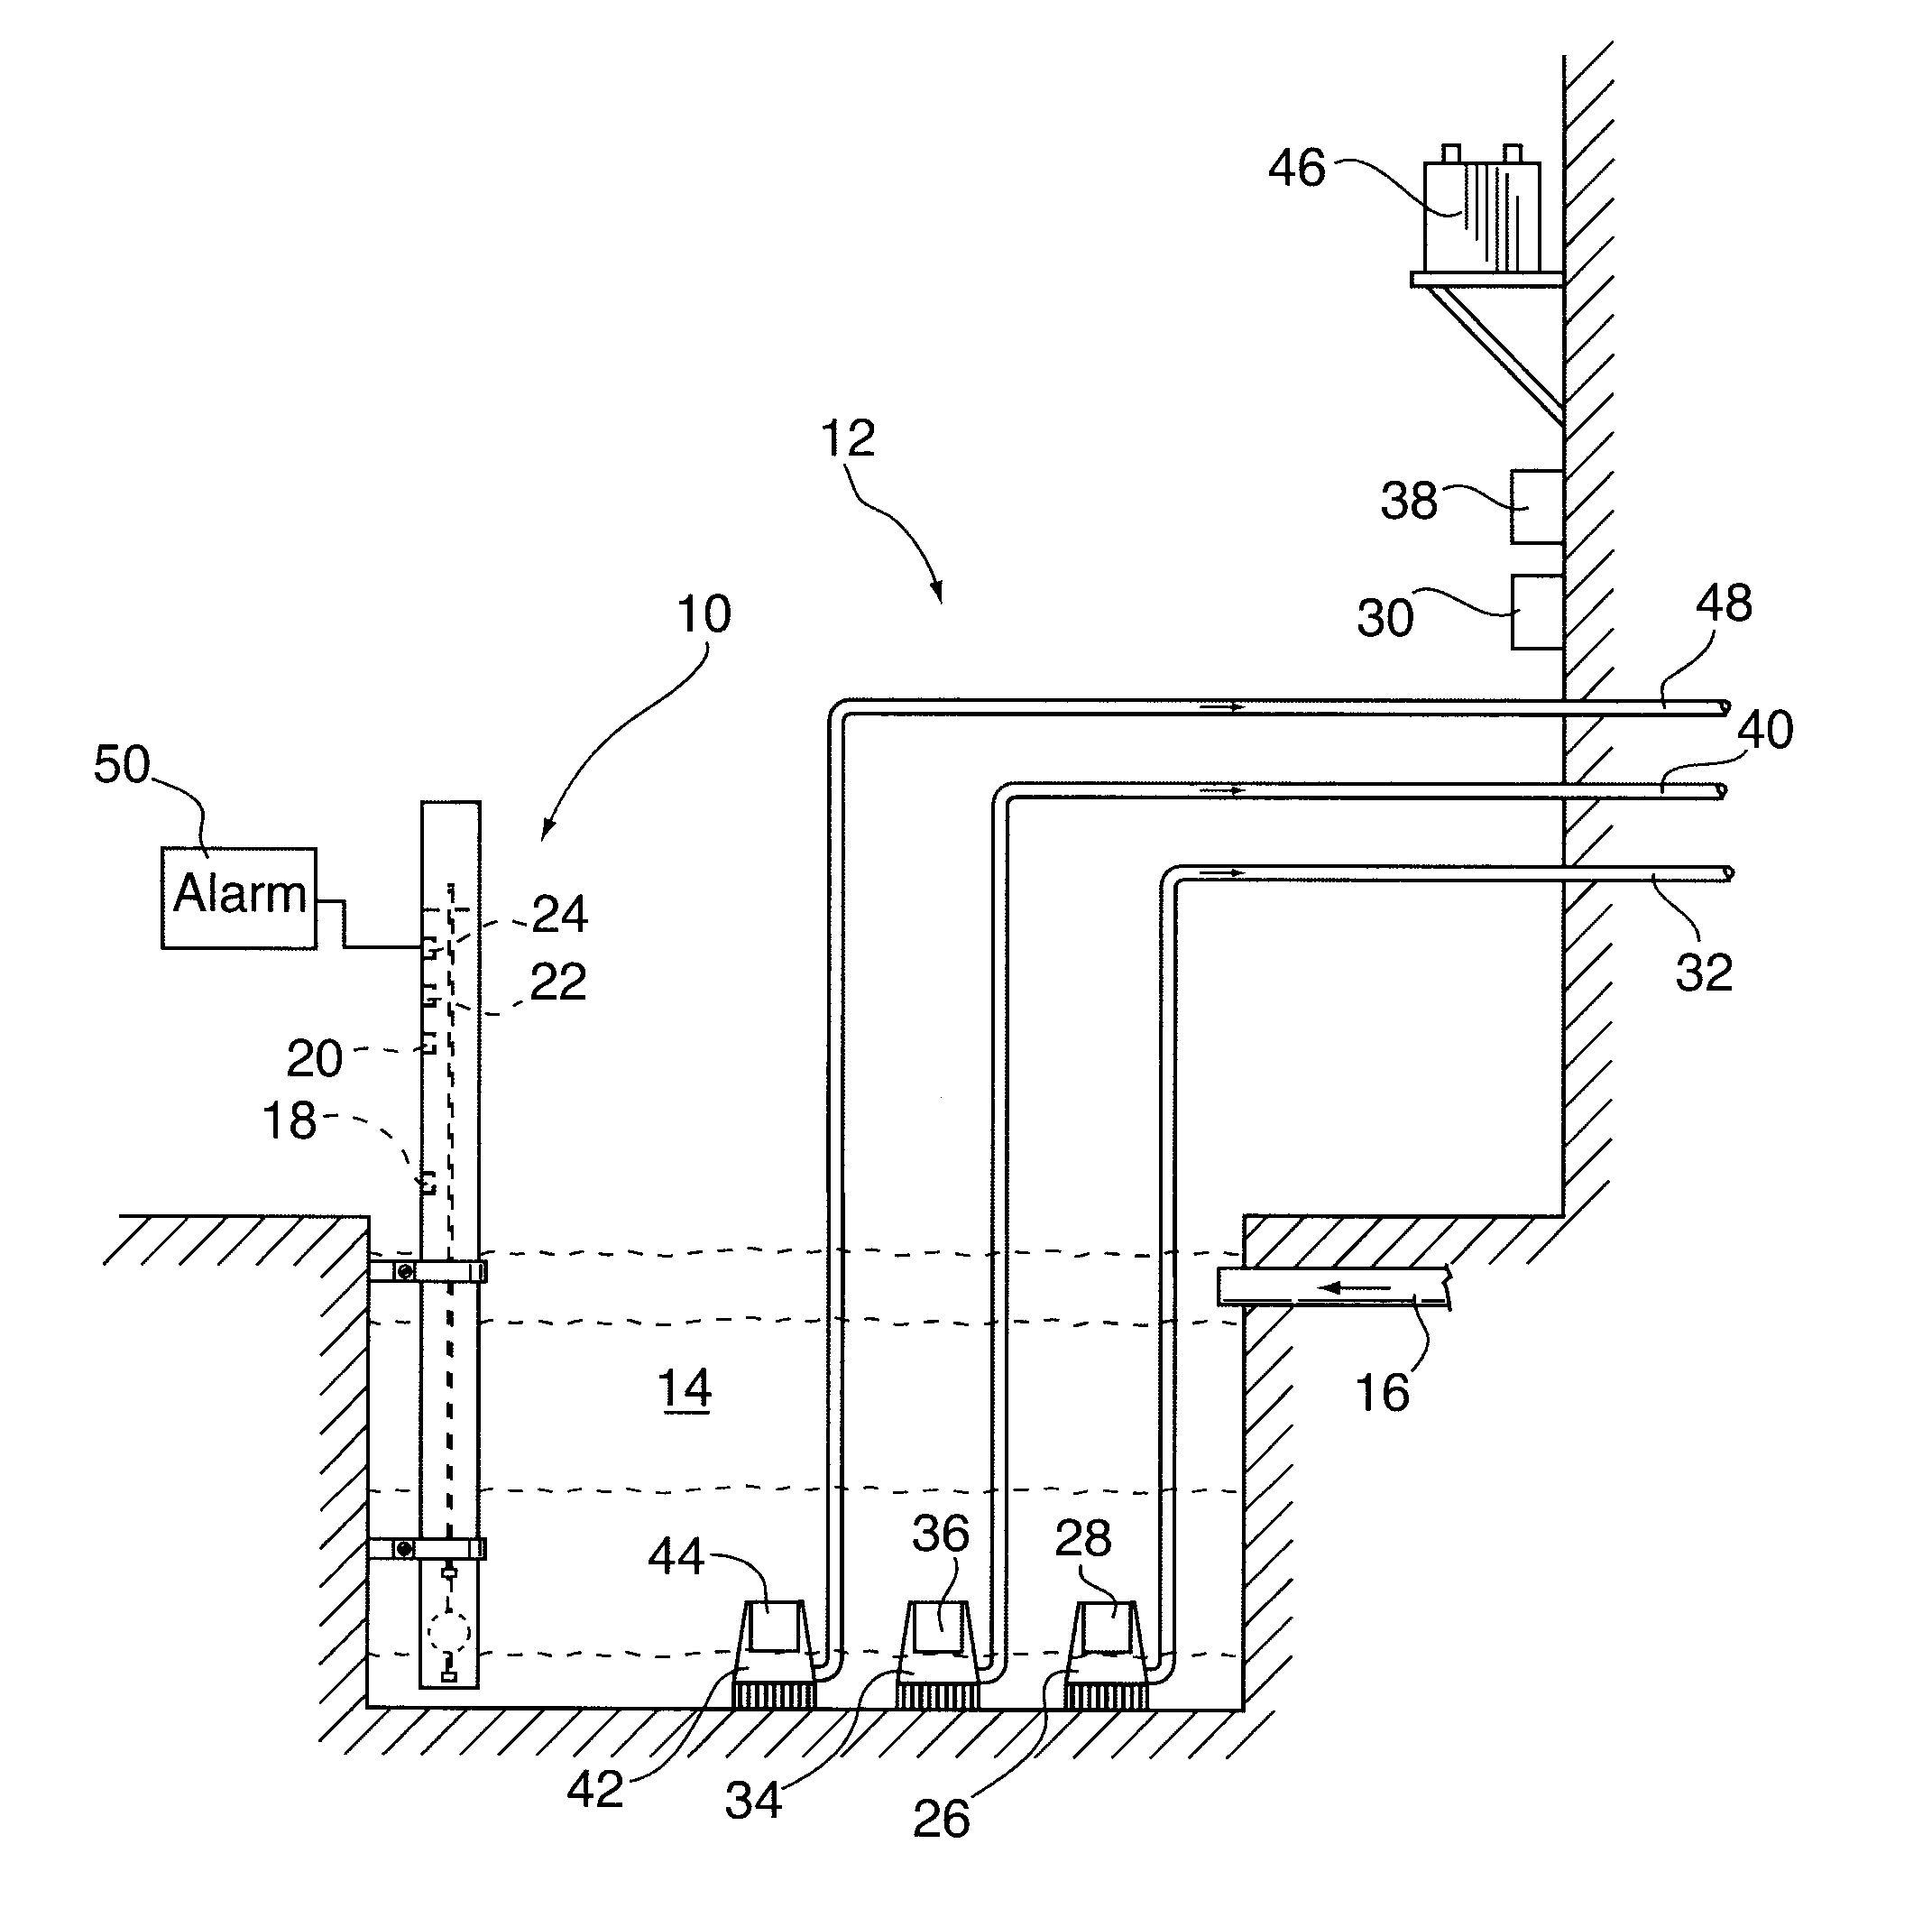 duplex pump control panel wiring diagram mazda bt 50 radio liberty sump switch ~ elsavadorla